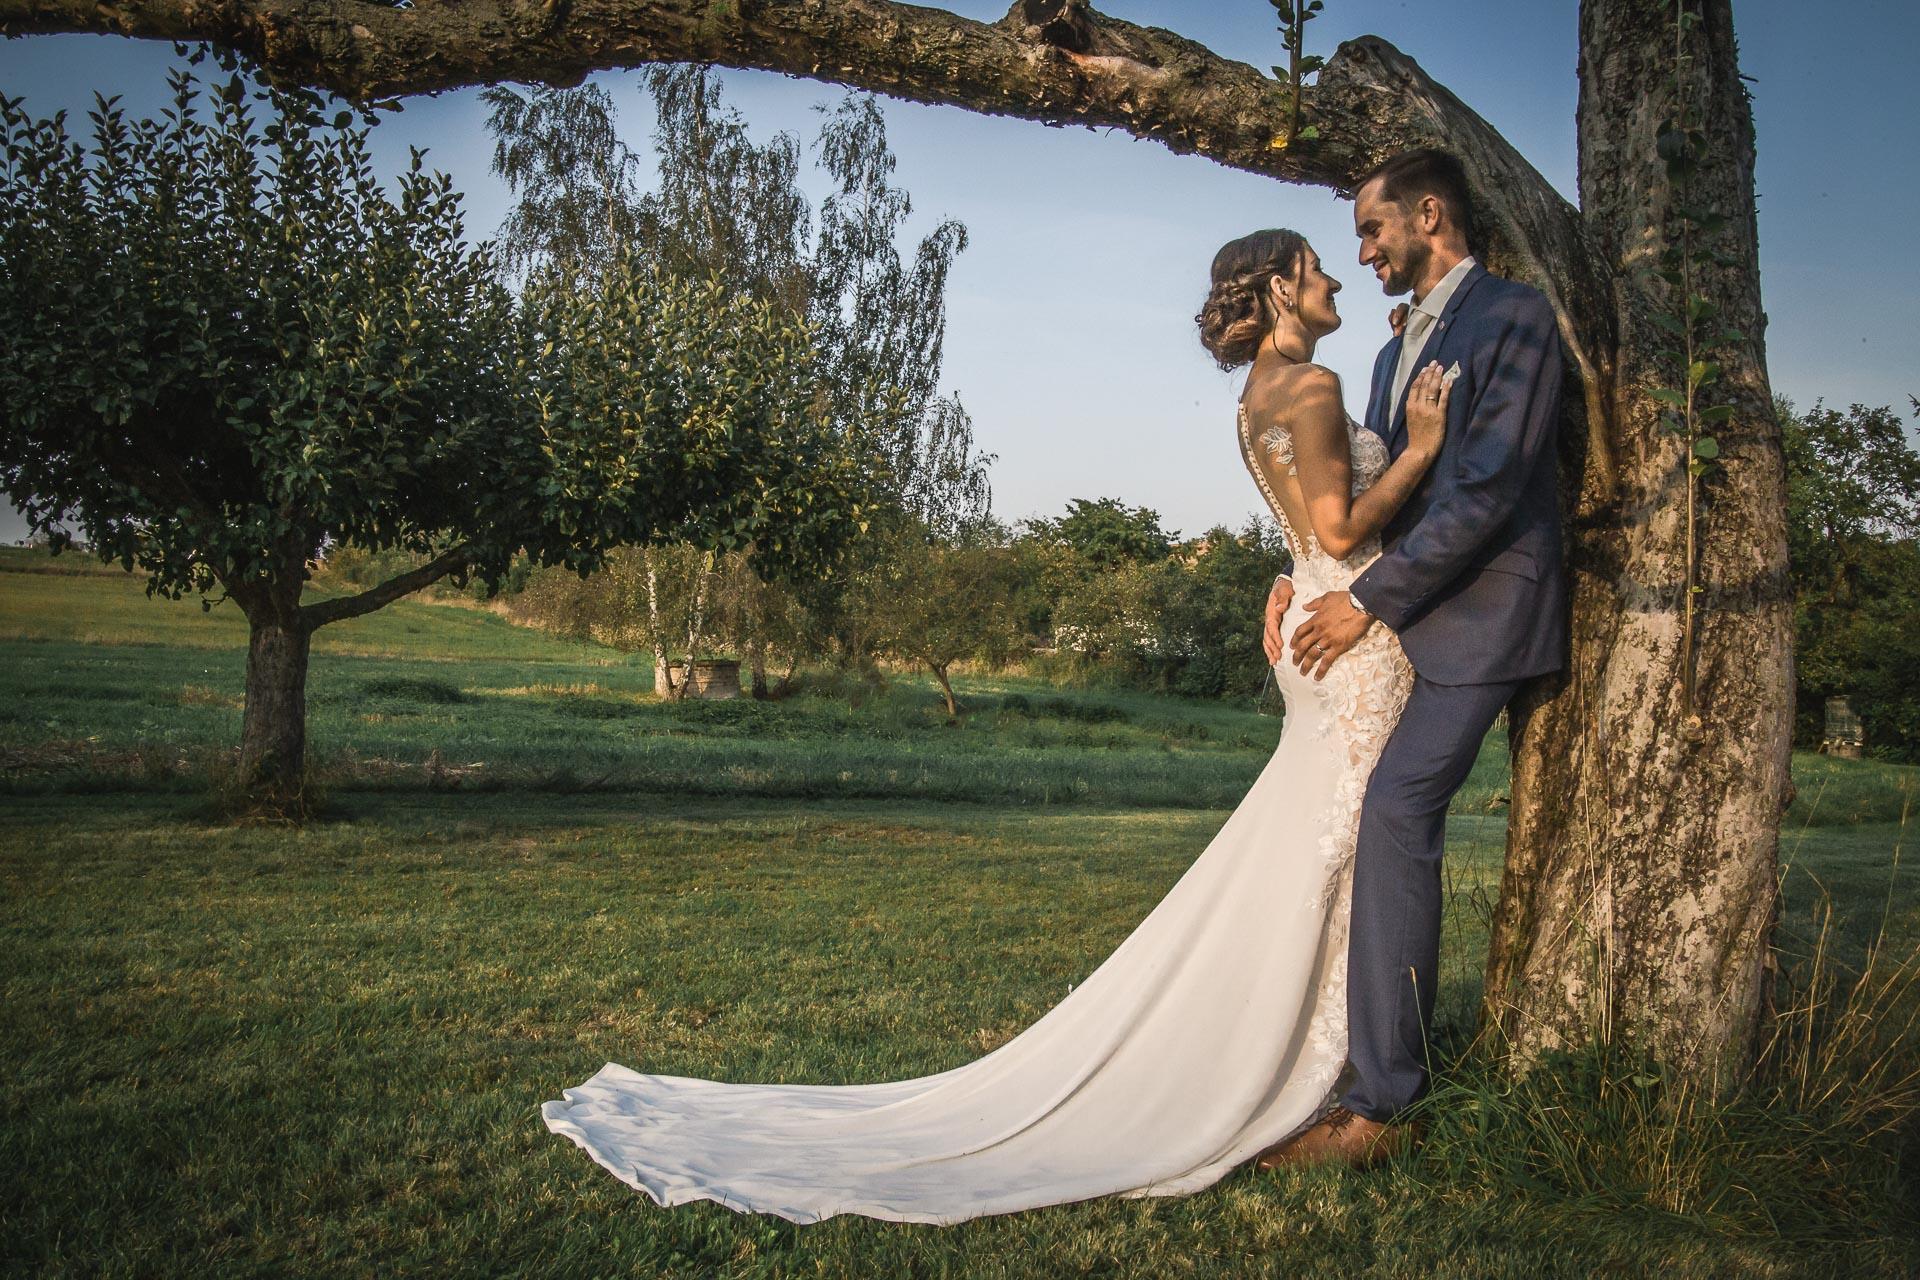 svatební-fotograf-wedding-svatebni-video-orlík-vltava-kostel-statek-stodola-boho-svatba-Beautyfoto-534